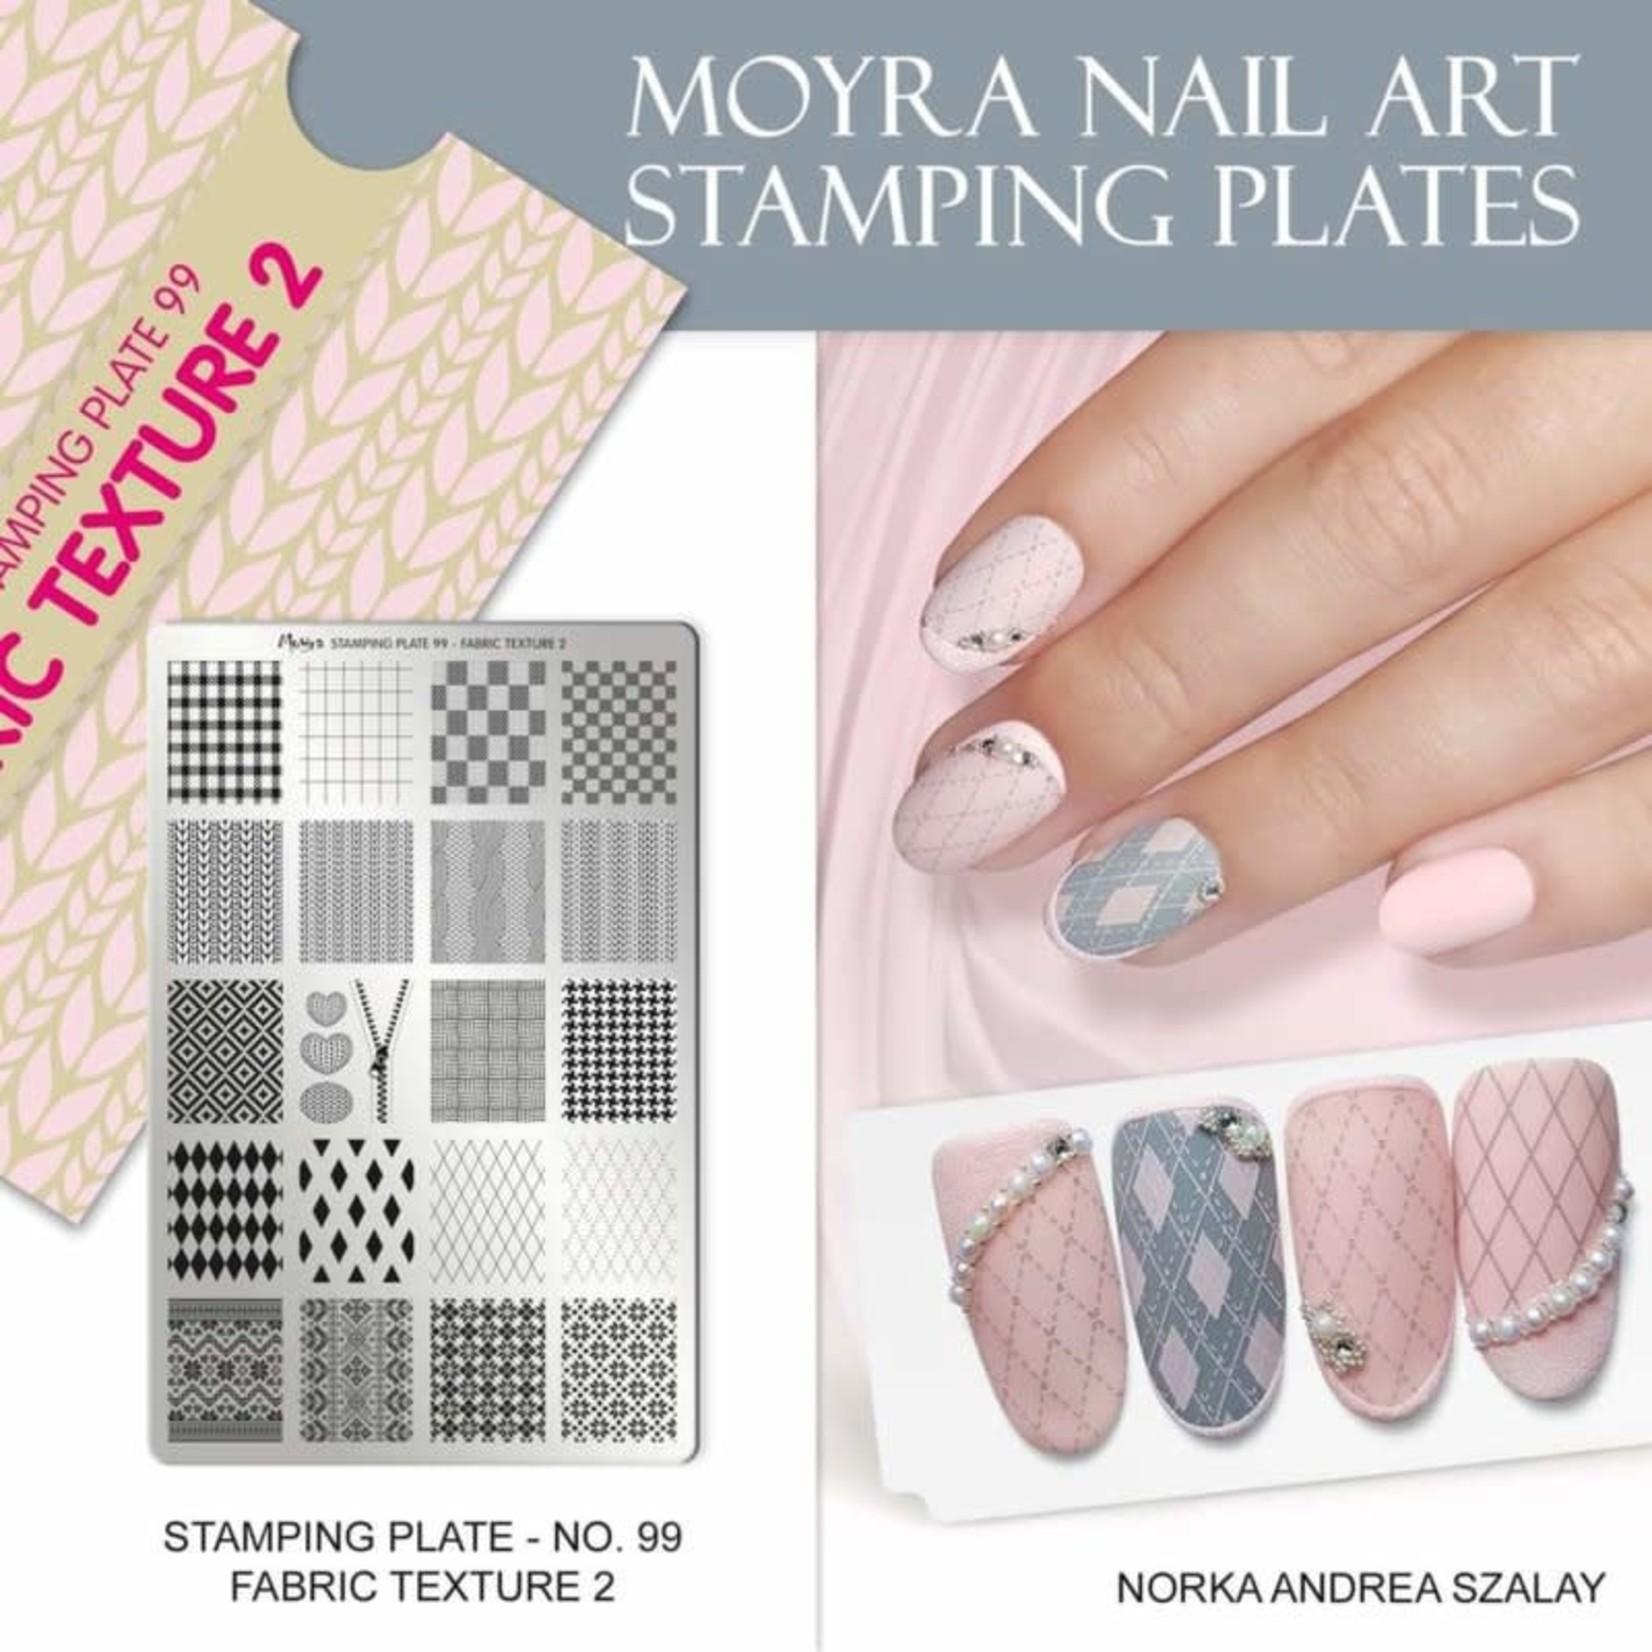 Moyra Moyra Stamping plate 99 Fabric Texture 2